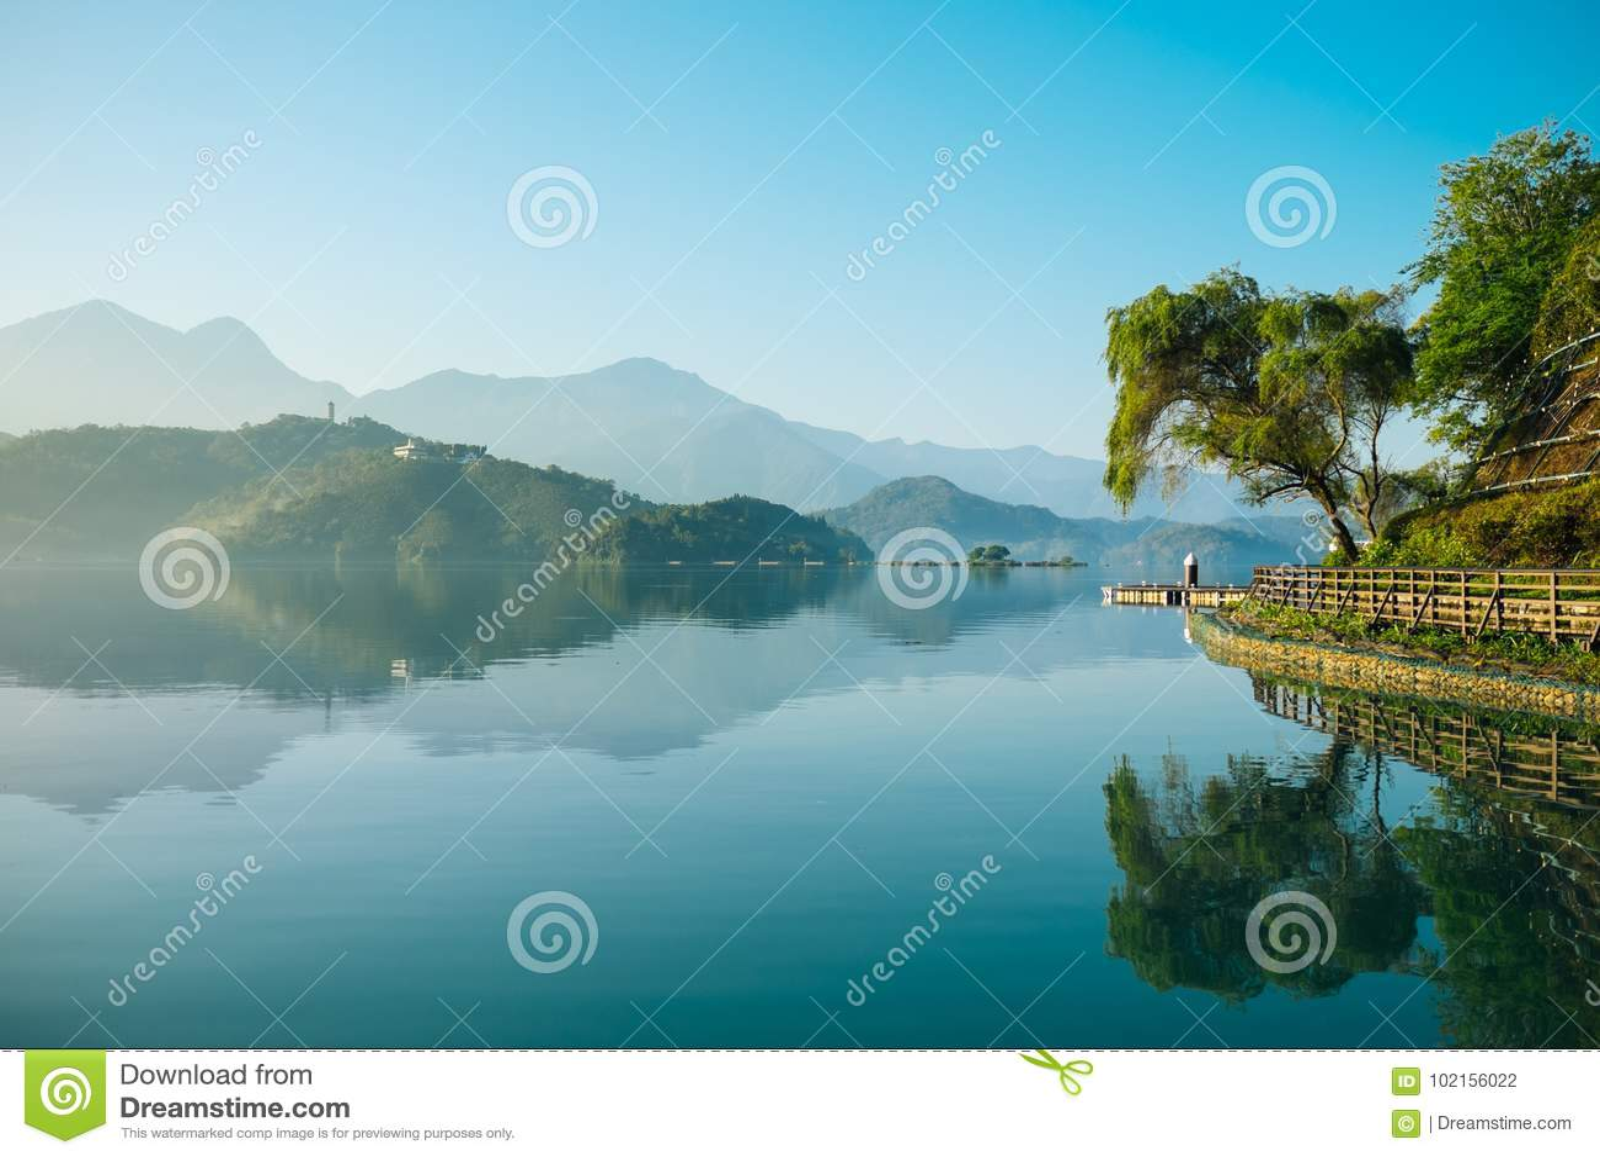 Reflection on the Sun Moon lake